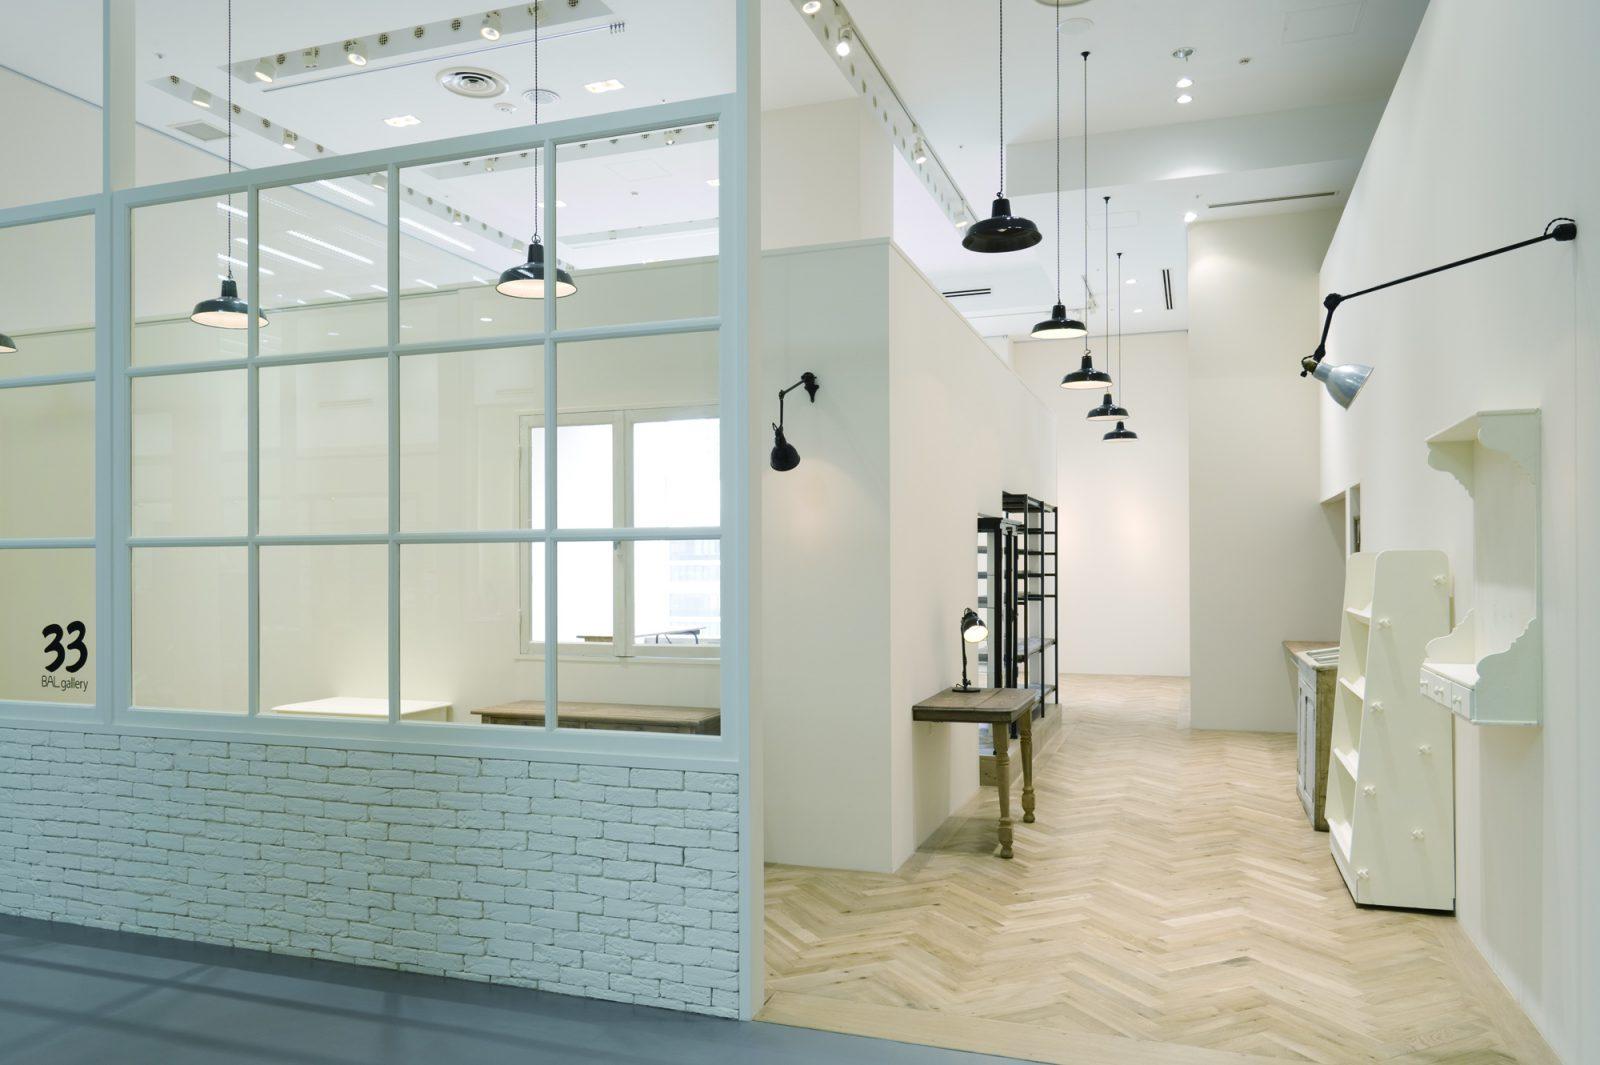 BAL gallery 33